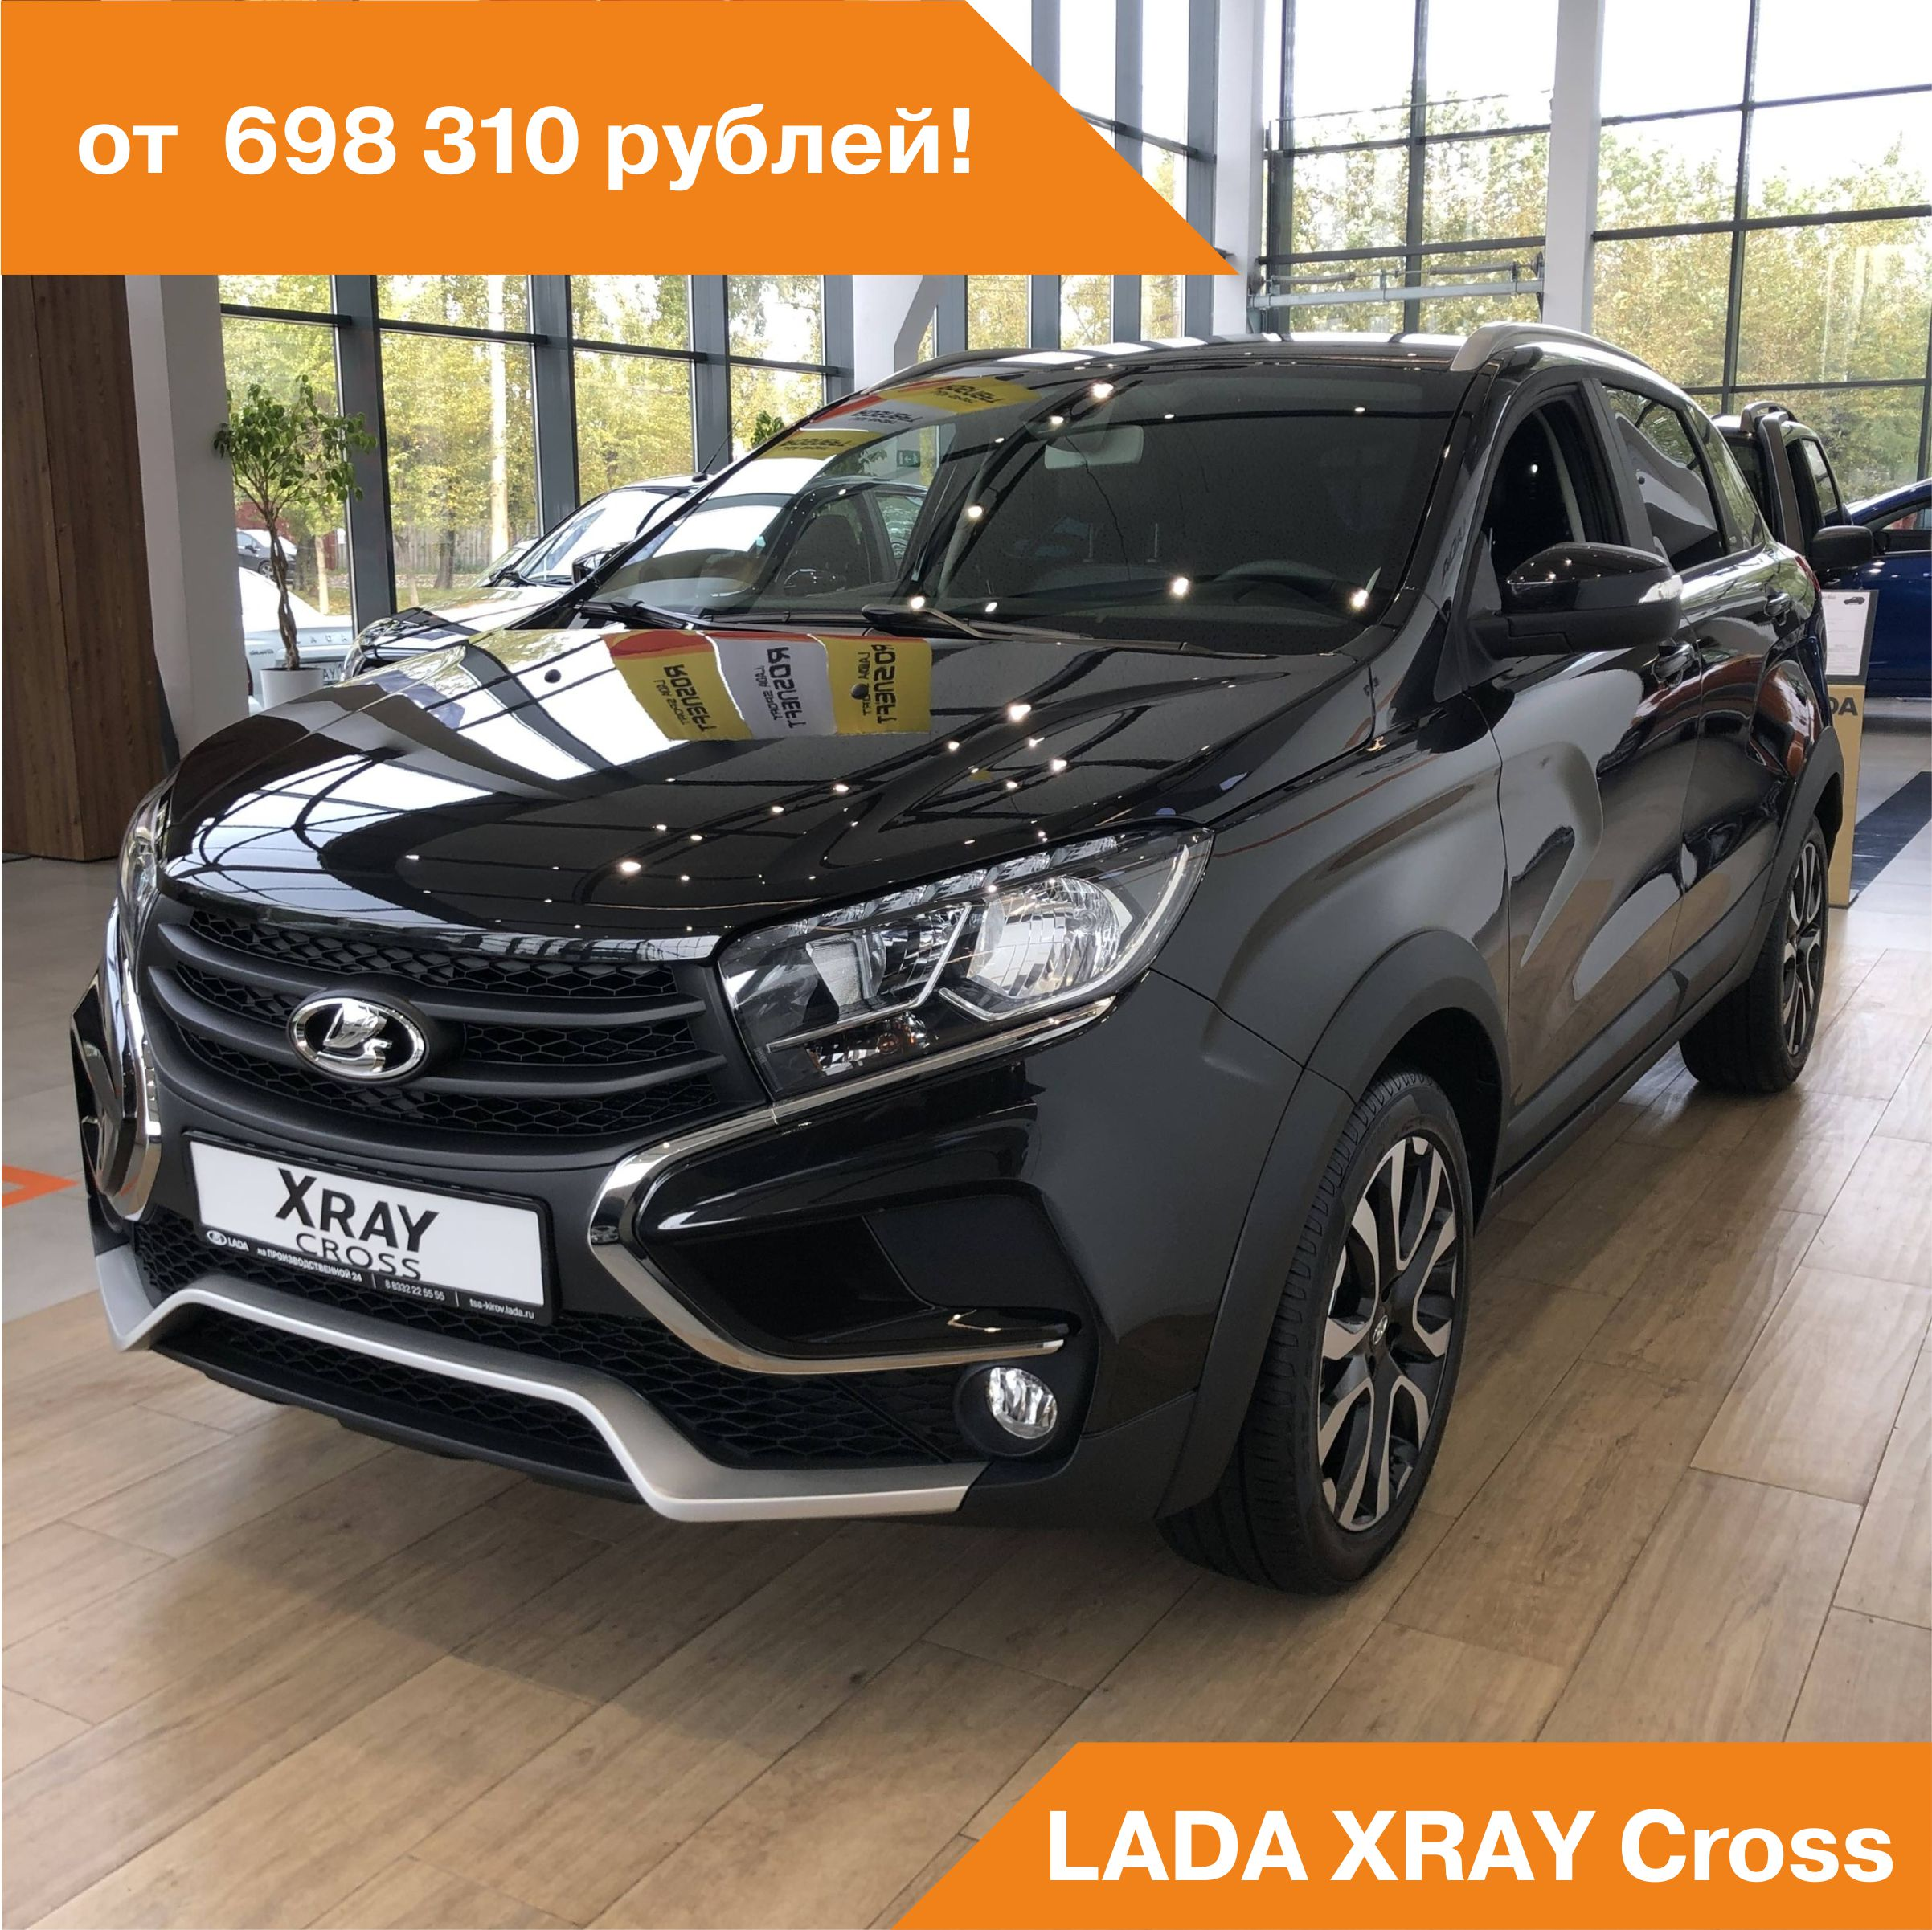 LADA Xray Cross от 698 310 рублей!